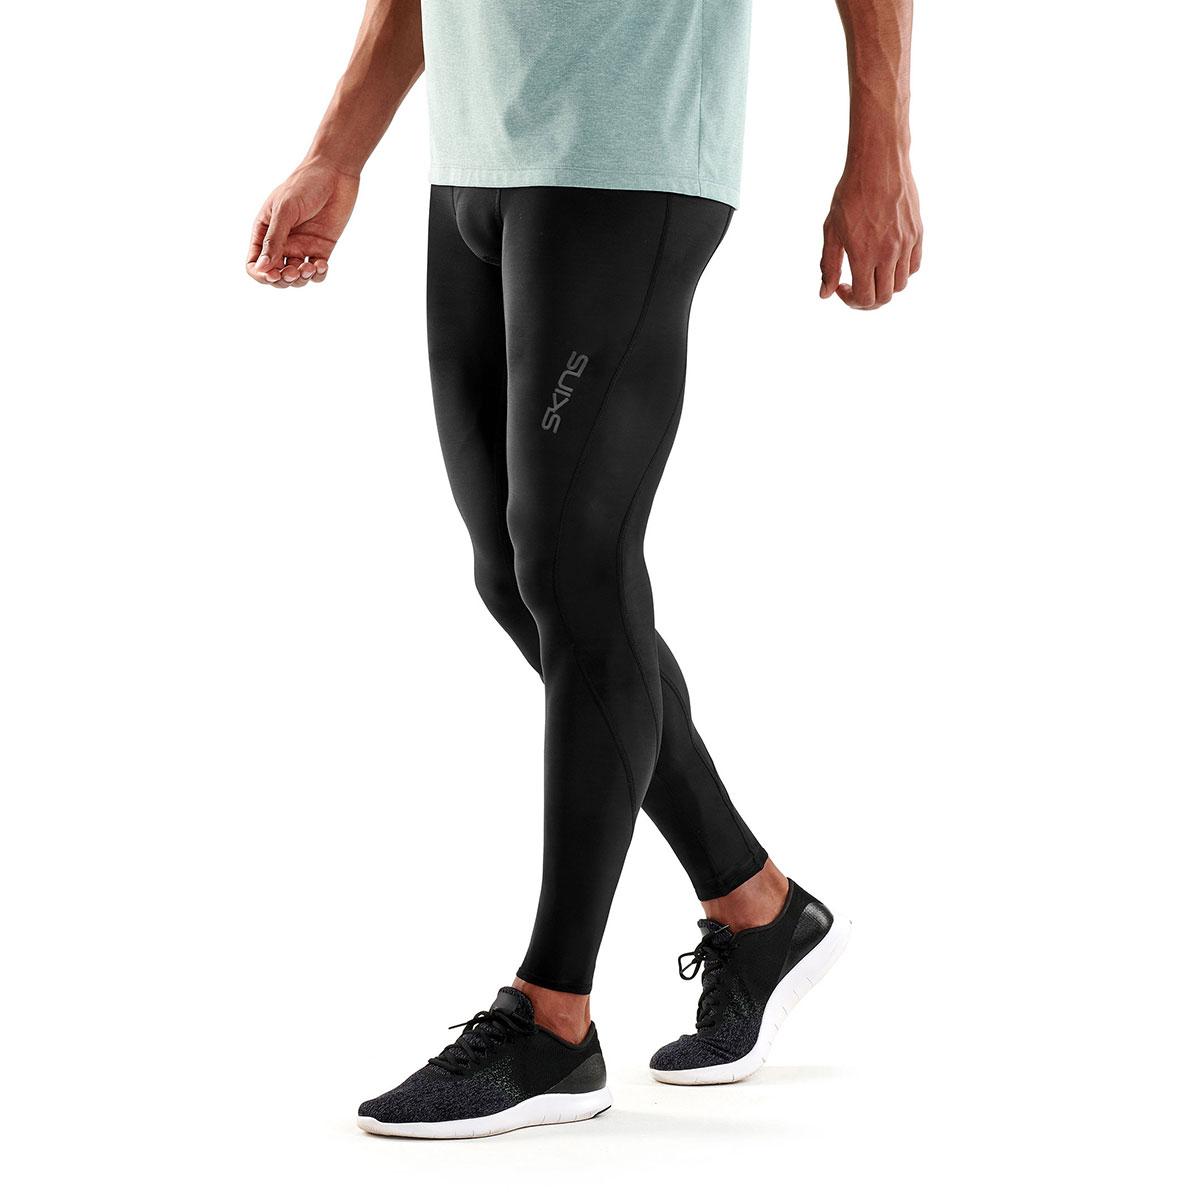 5b9dcf8460 Skins Dnamic-long Tights - Running trousers for Men - Black | 21RUN